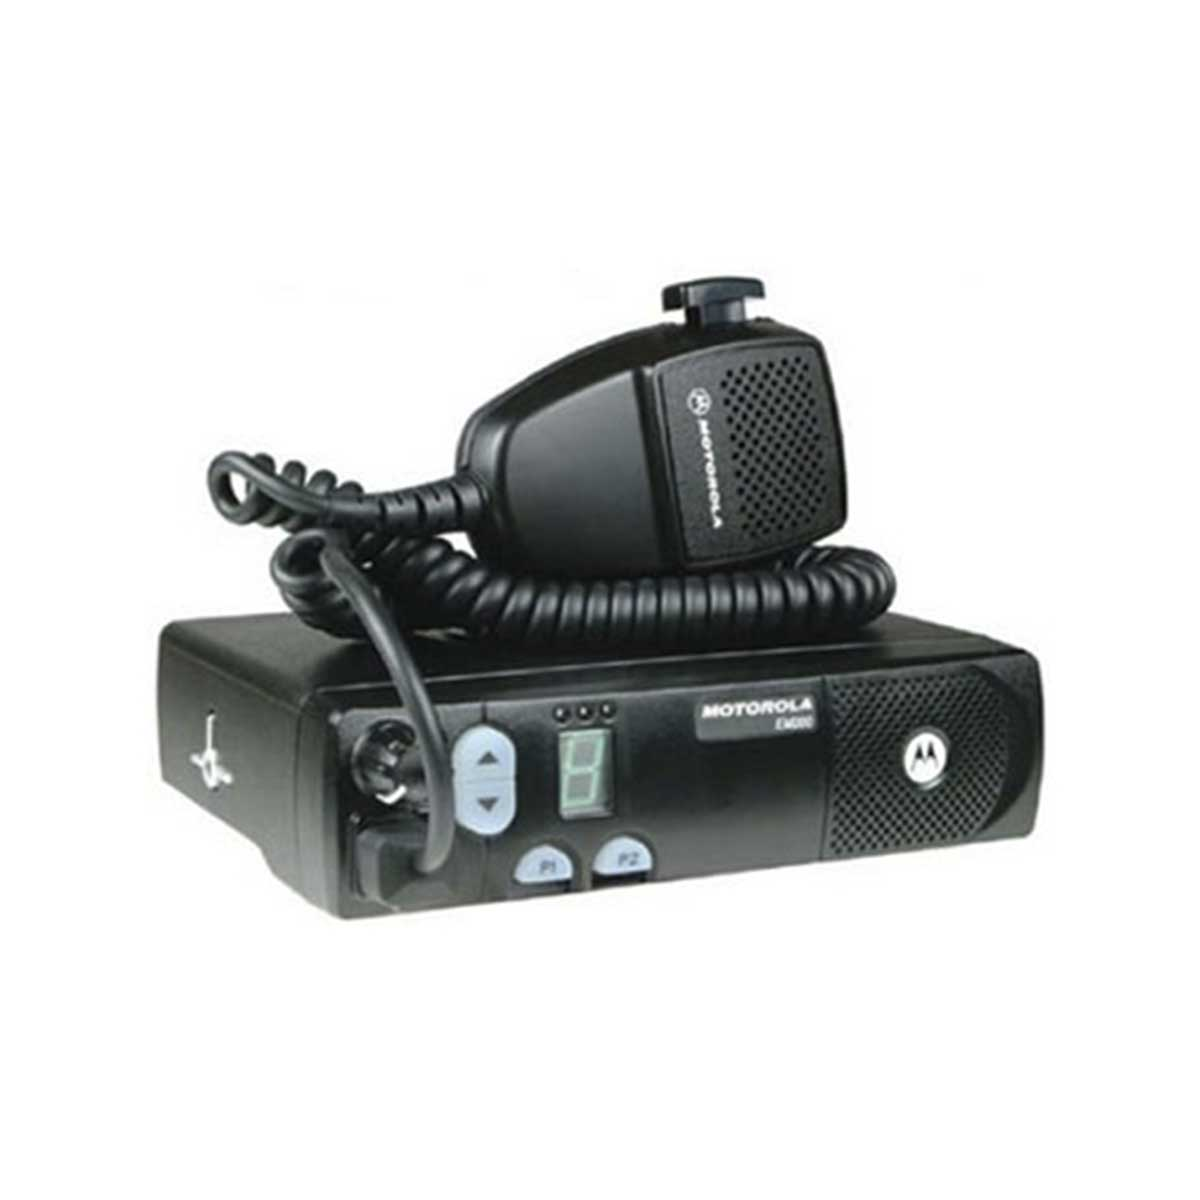 Radio Motorola EM200 Analógico LAM50JNC9AA1AN VHF 136-162 MHz